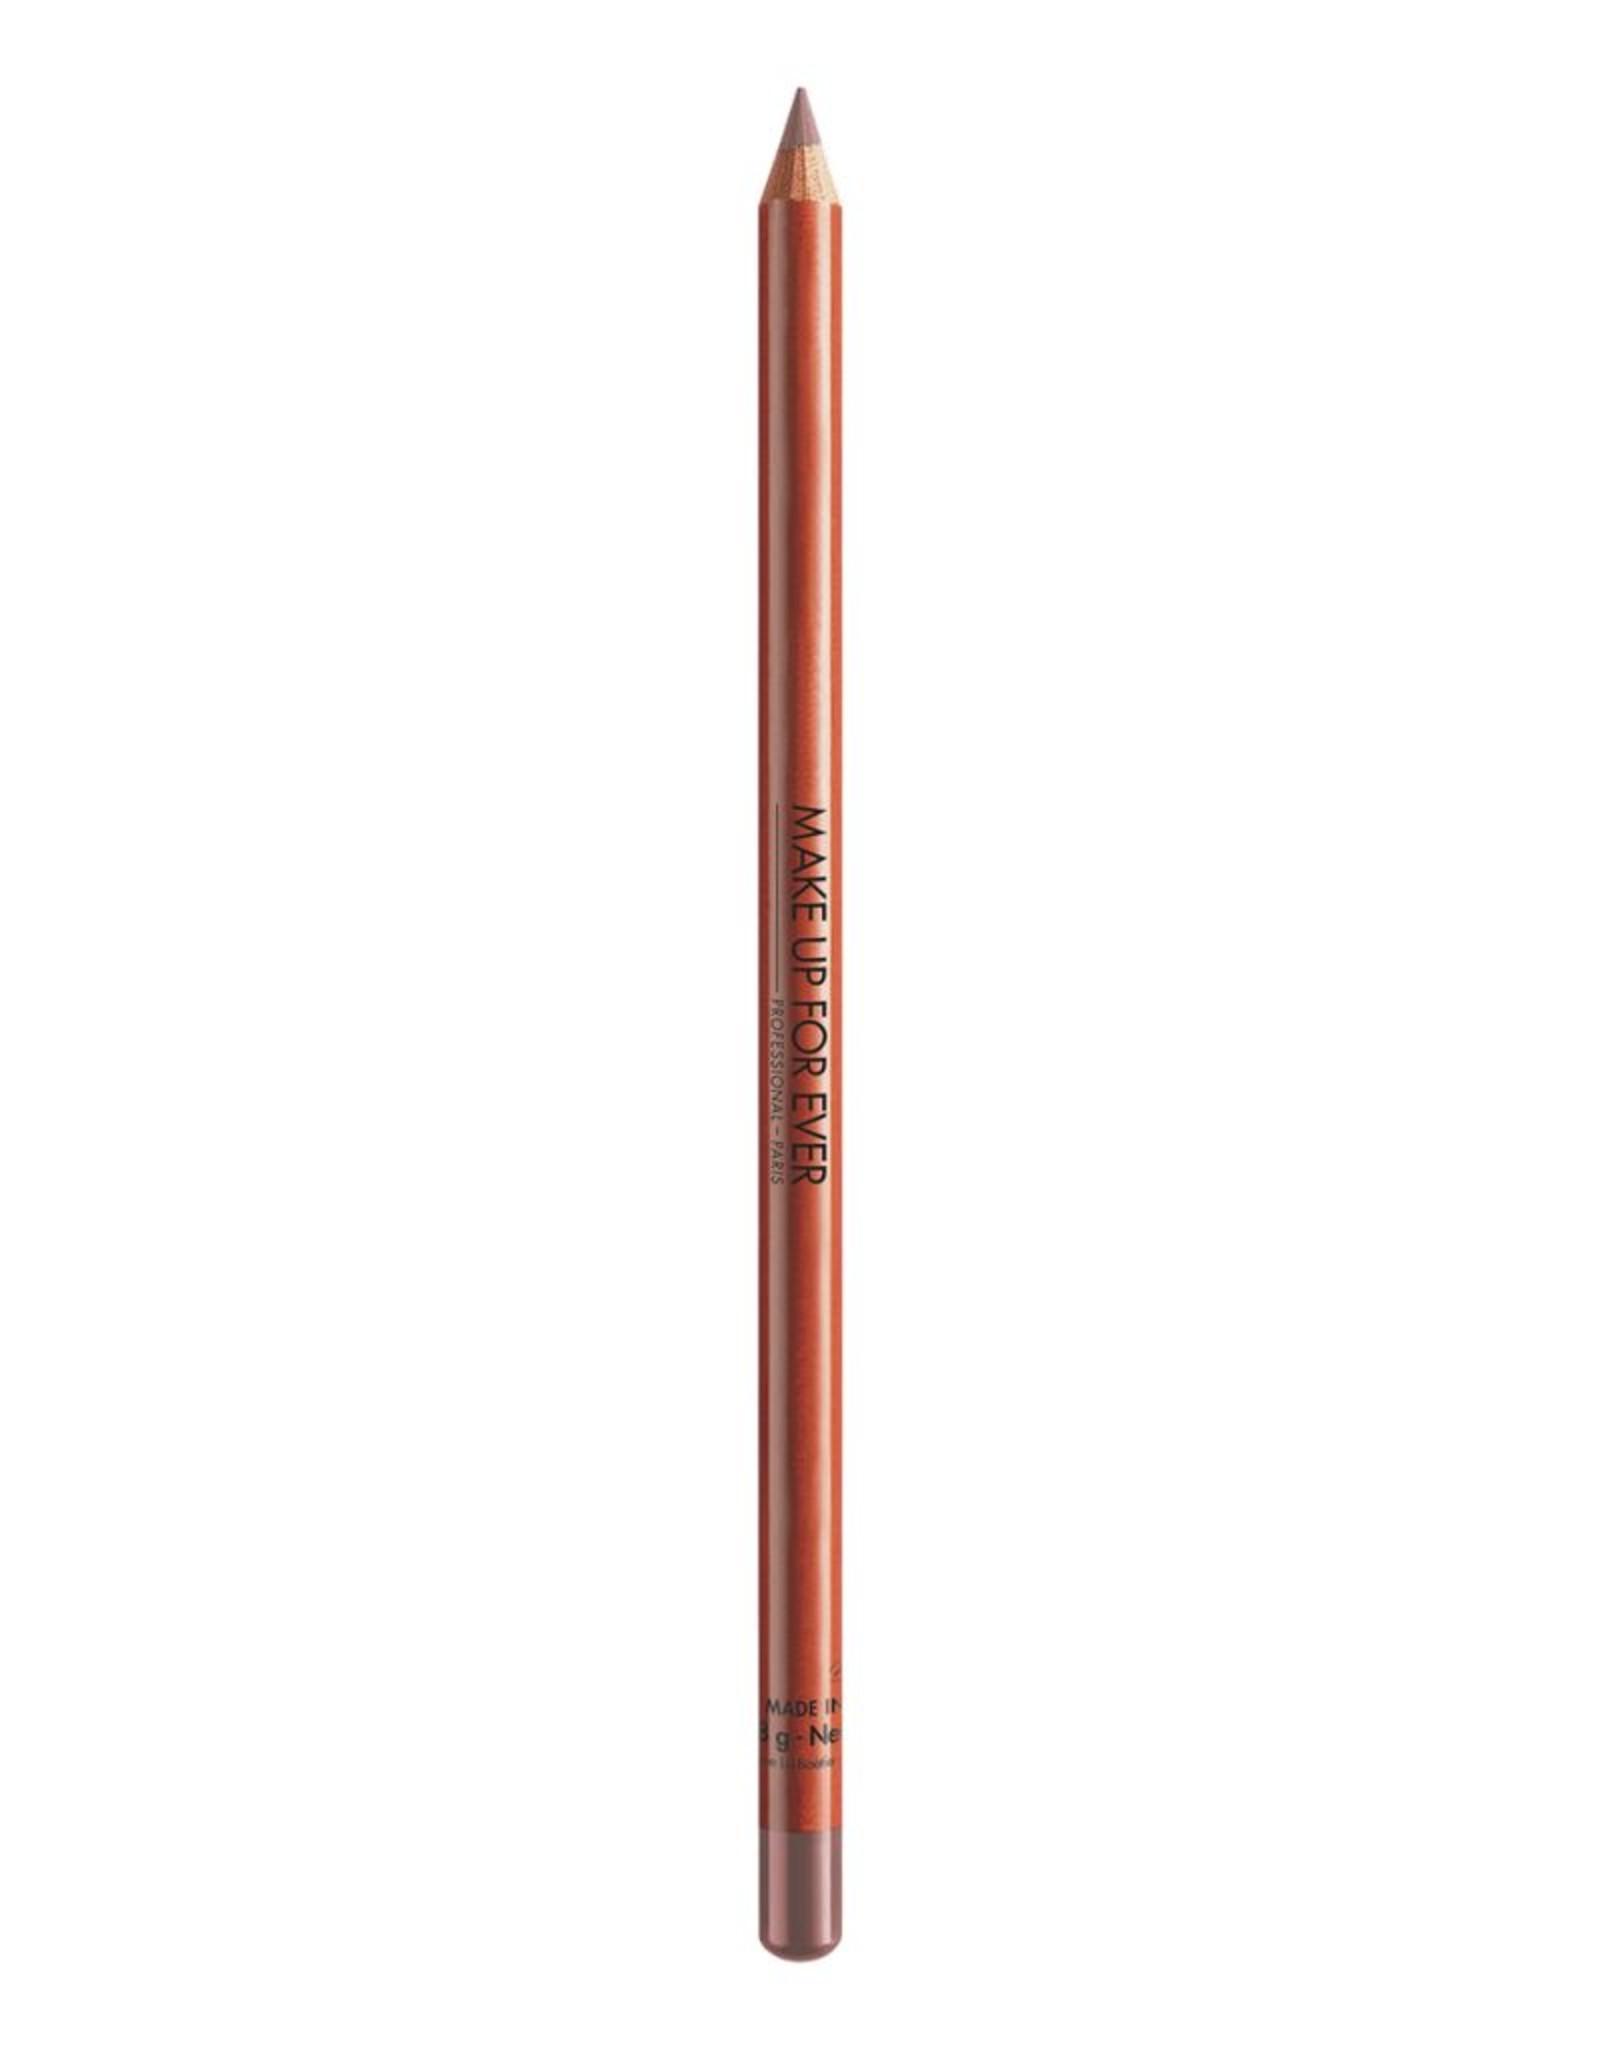 MUFE CRAYON LEVRES 1,8g N37 brun cuivre /  copper brown